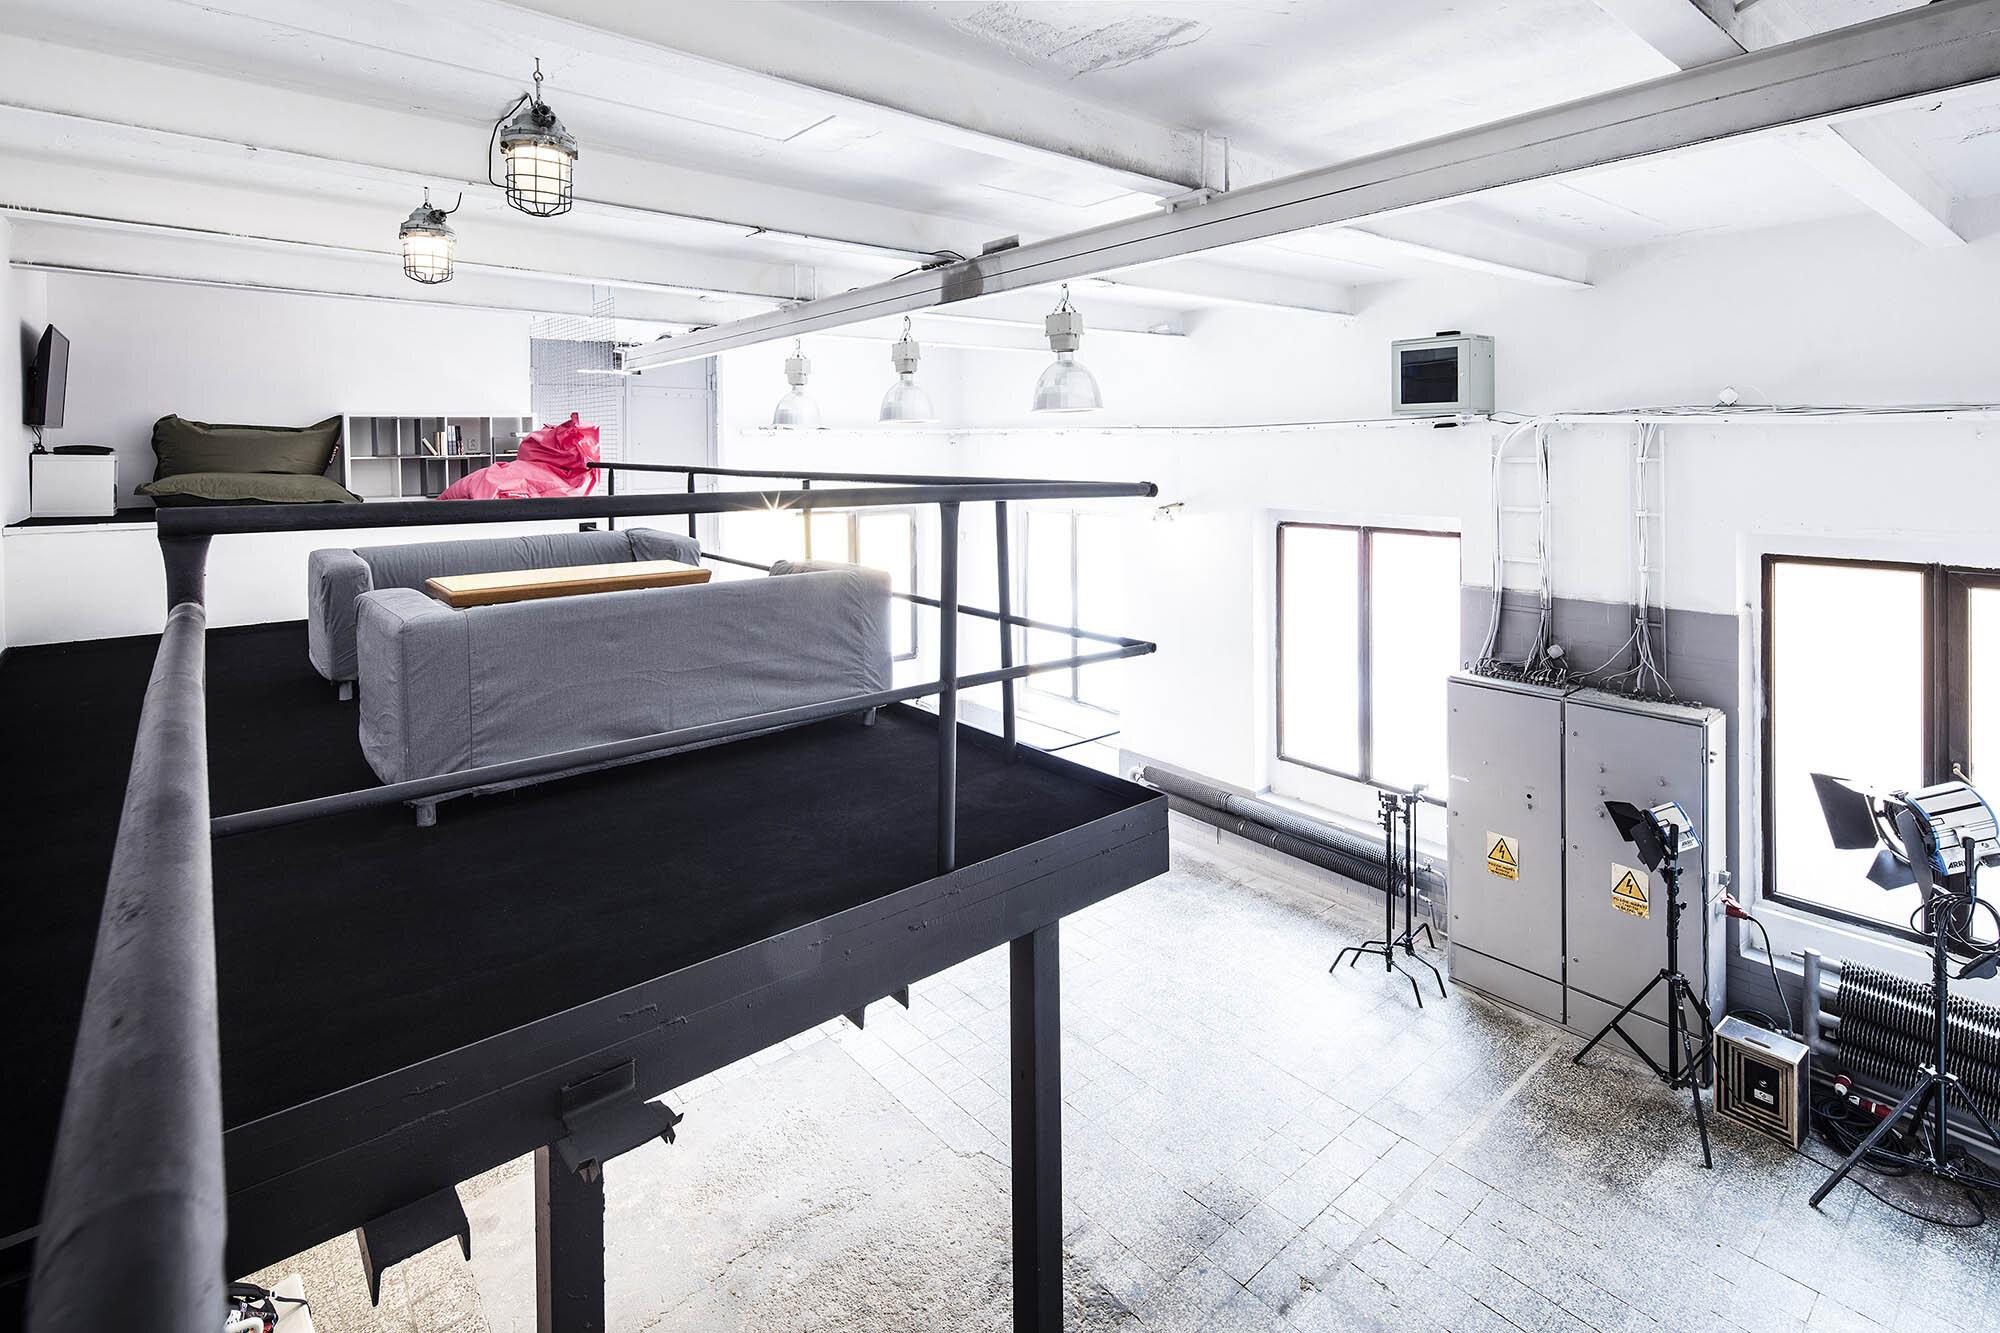 Studio Dvojka (1)-6.jpg